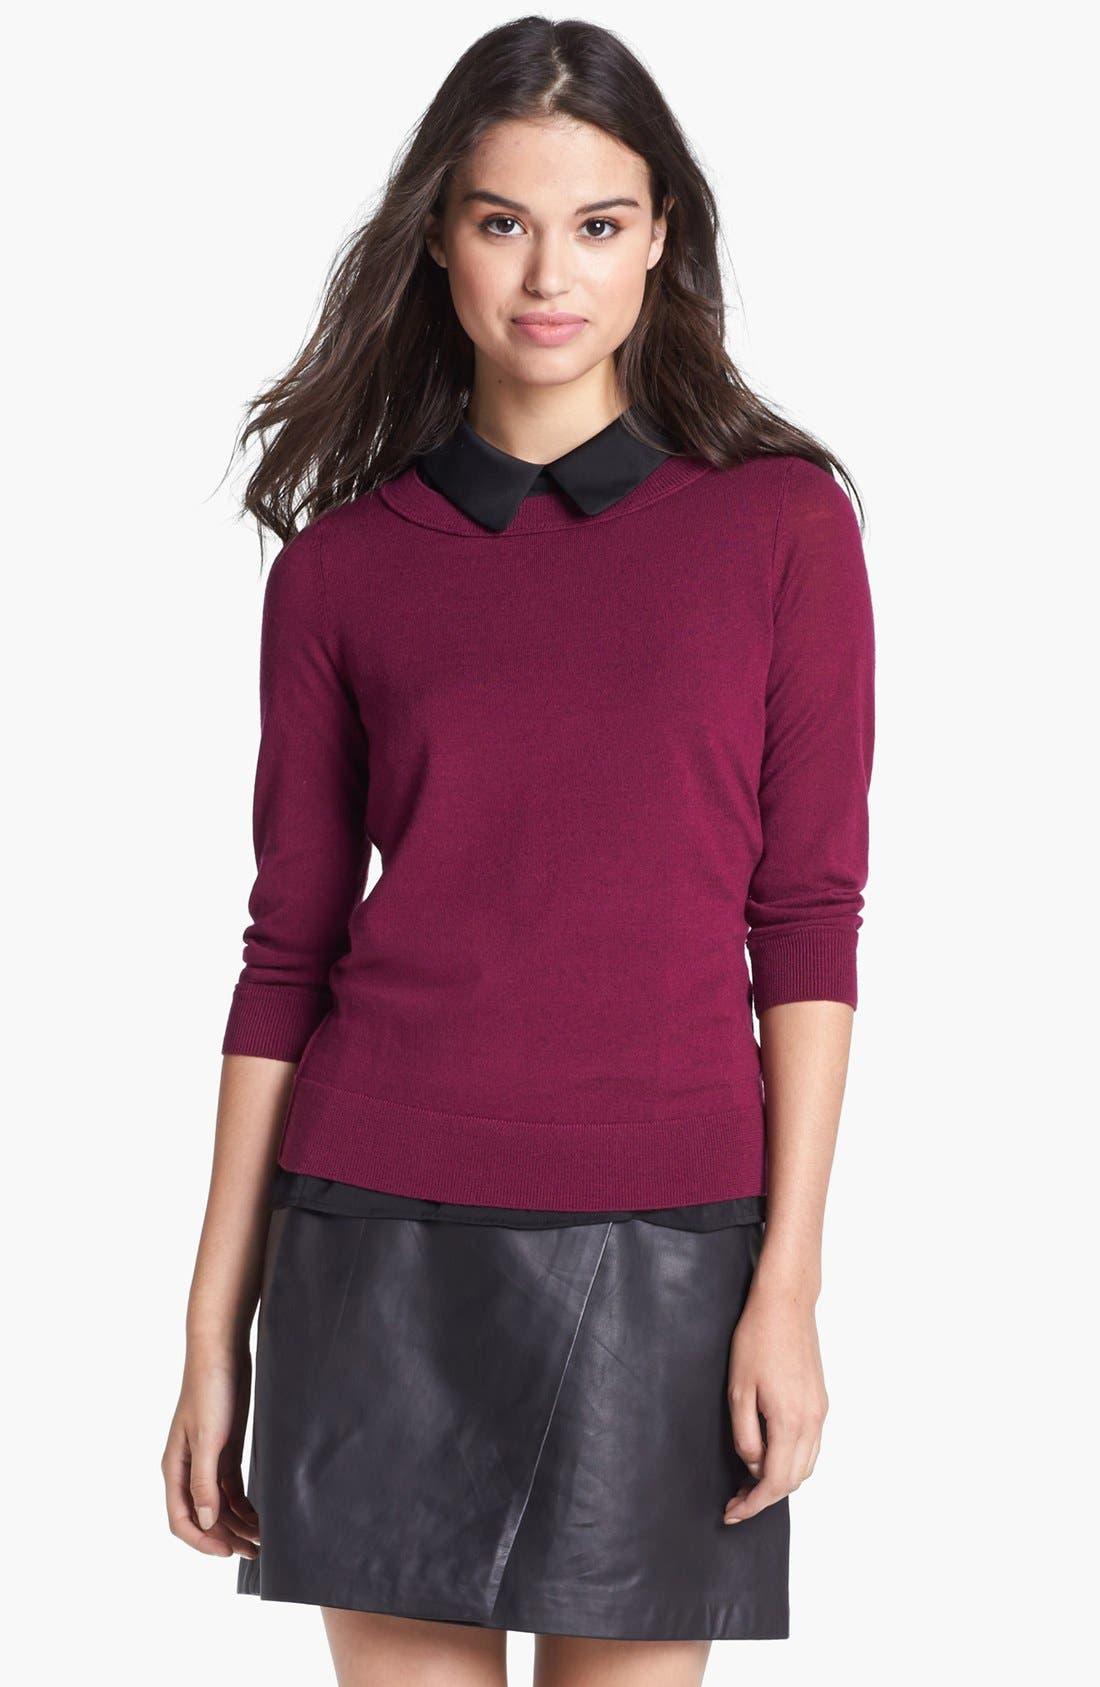 Alternate Image 1 Selected - Halogen® Three Quarter Sleeve Crewneck Sweater